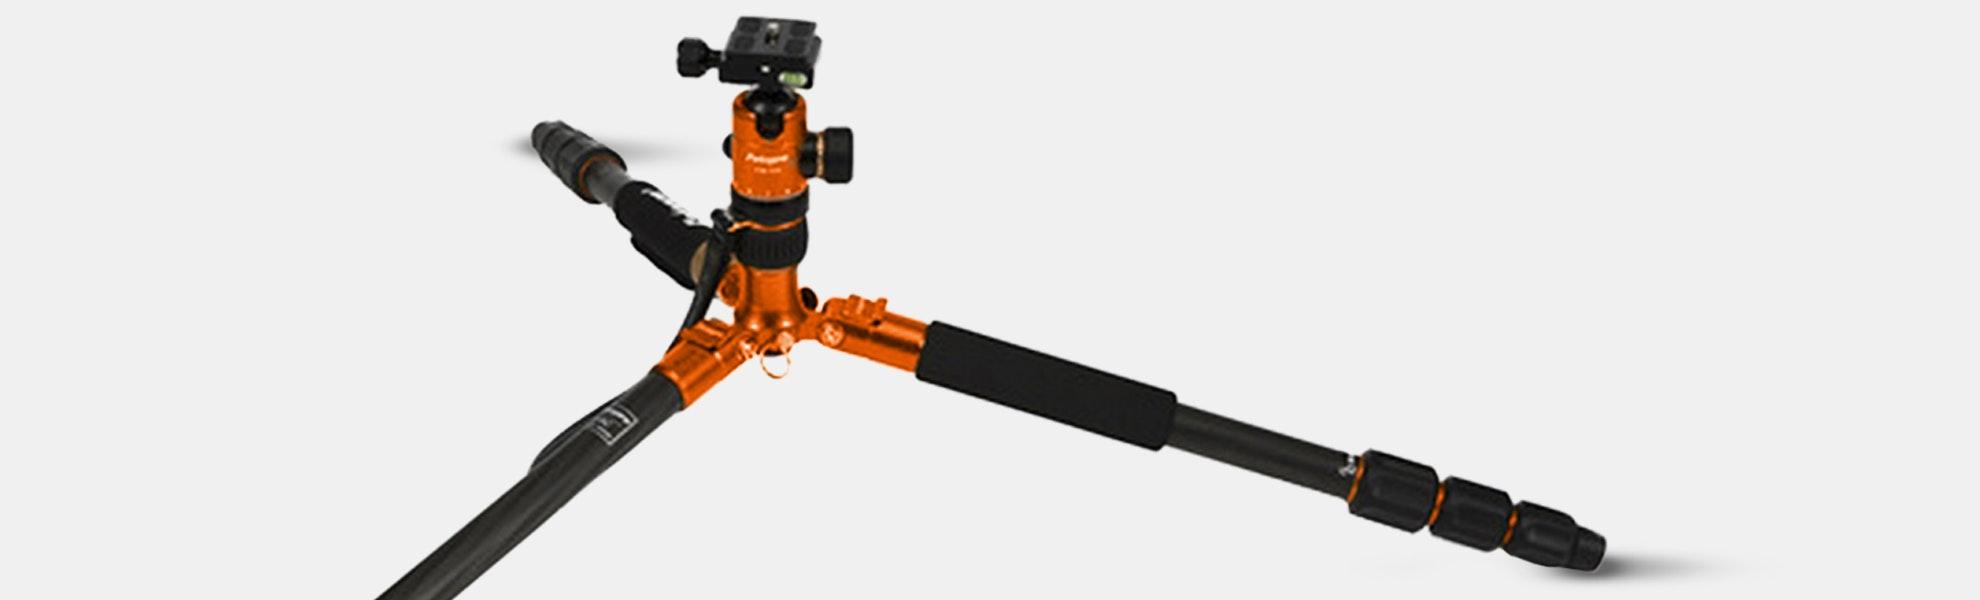 Fotopro C5c Carbon Fiber Tripod/Monopod & Head